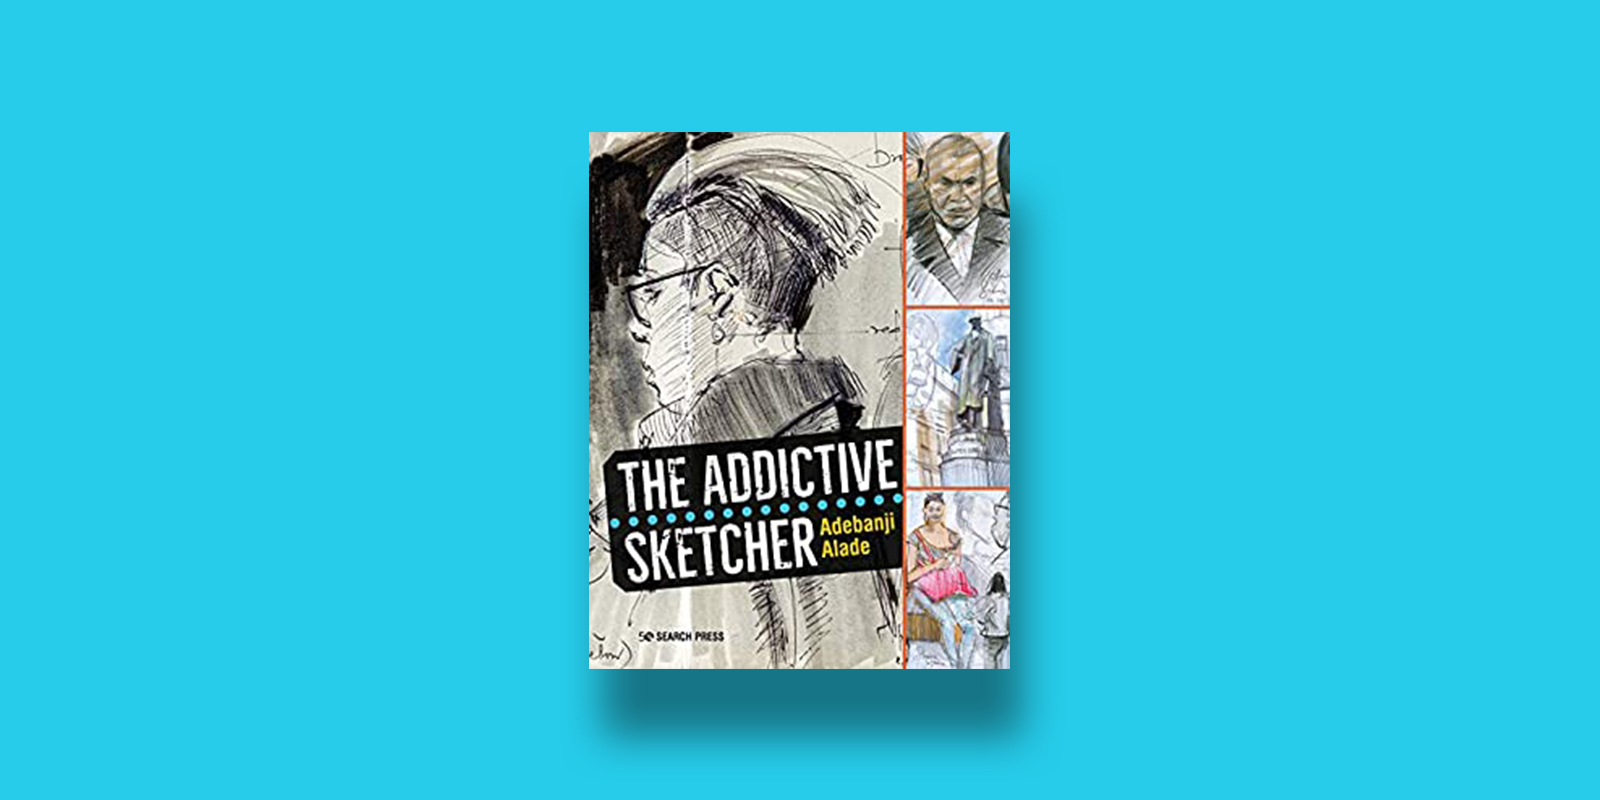 The Addictive Sketcher Best Illustration Books